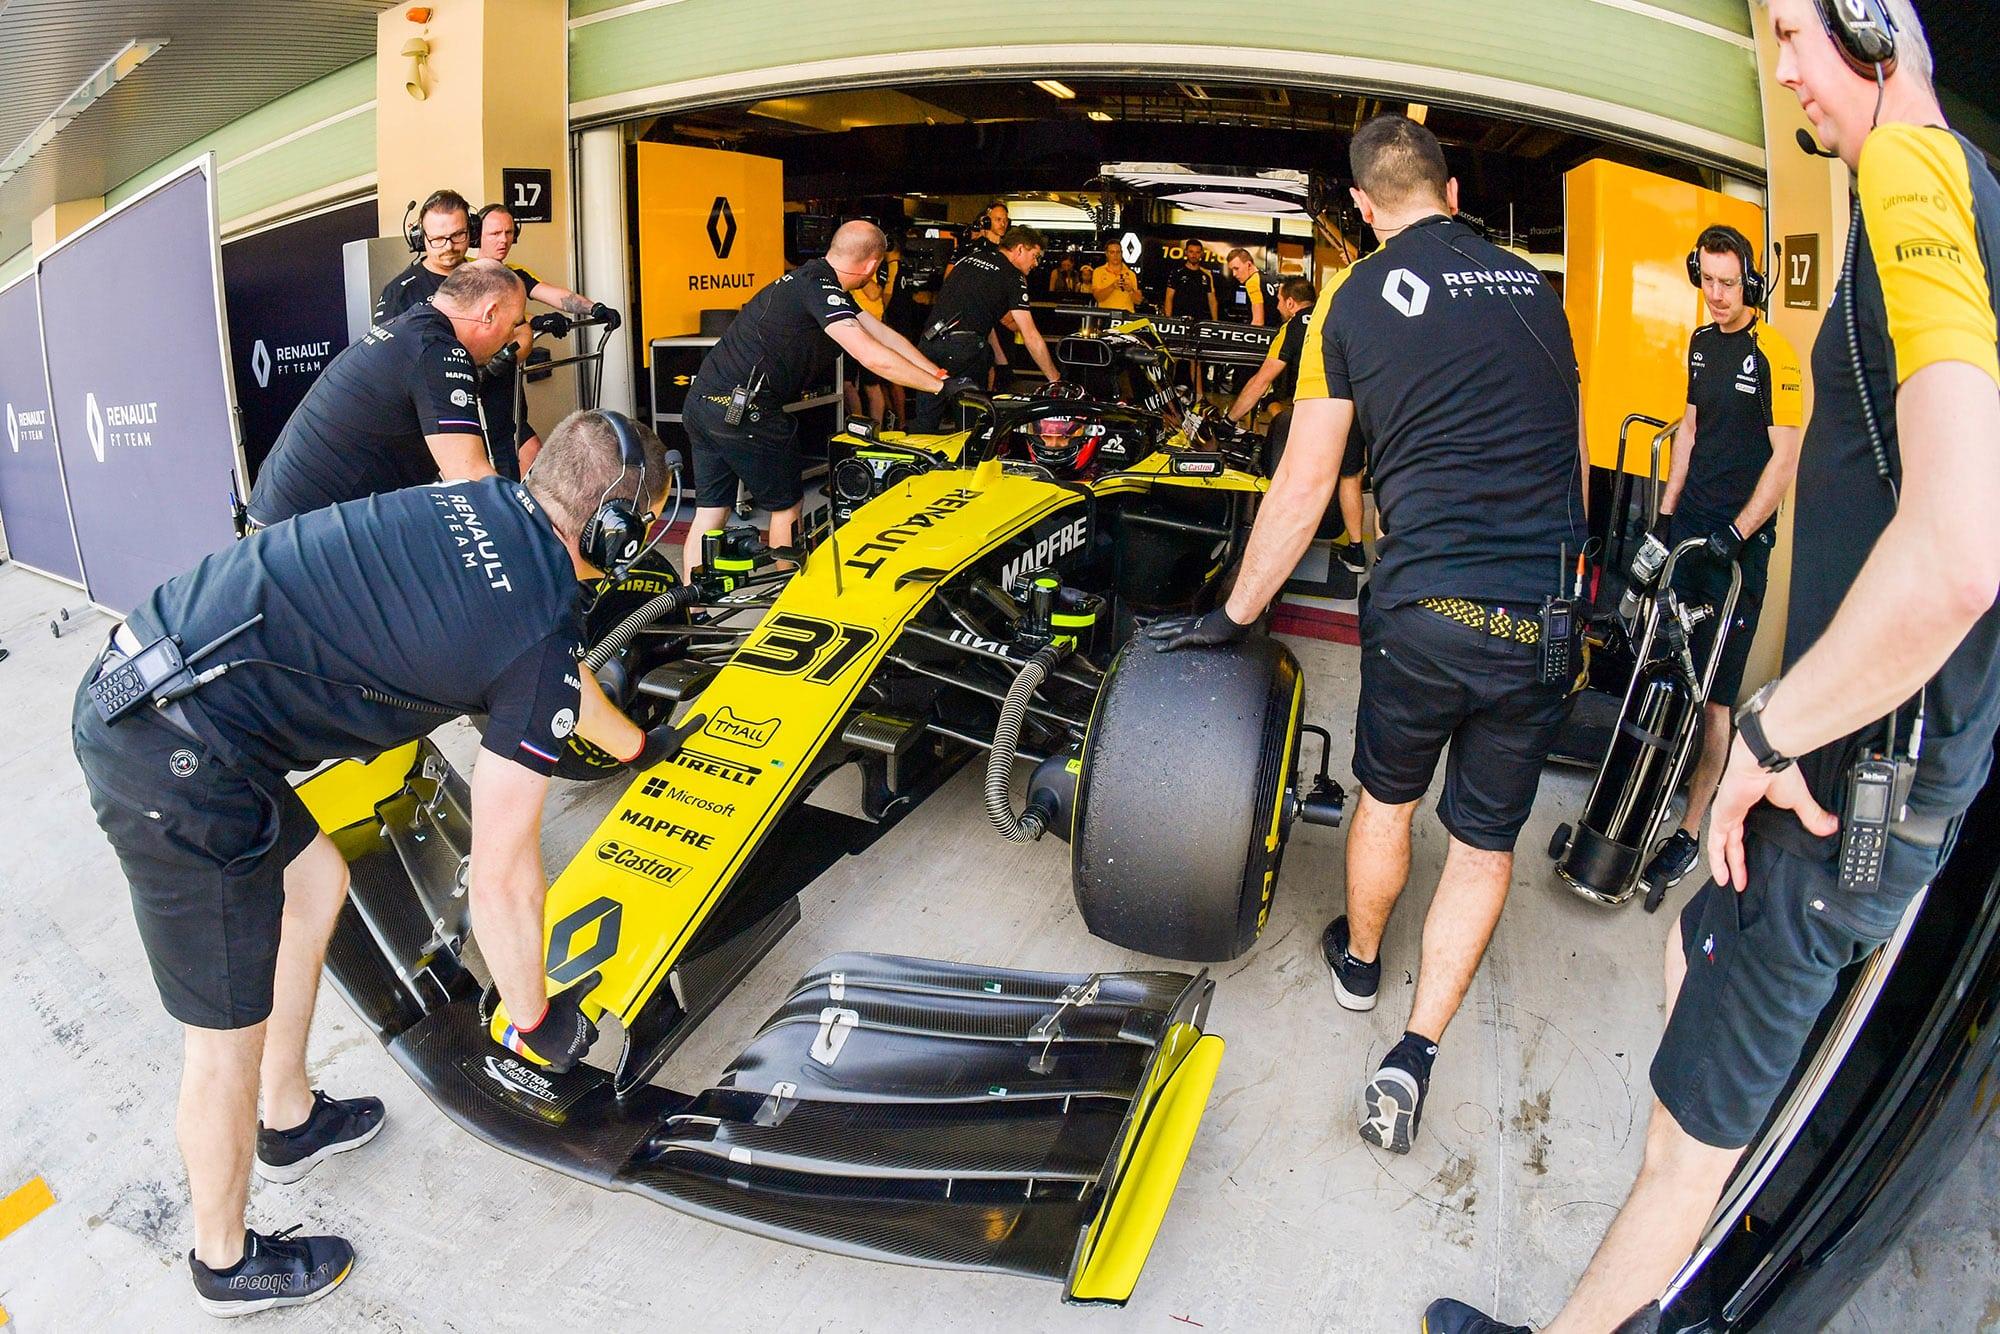 Esteban Ocon's Renault in 2019 F1 end-of-season testing